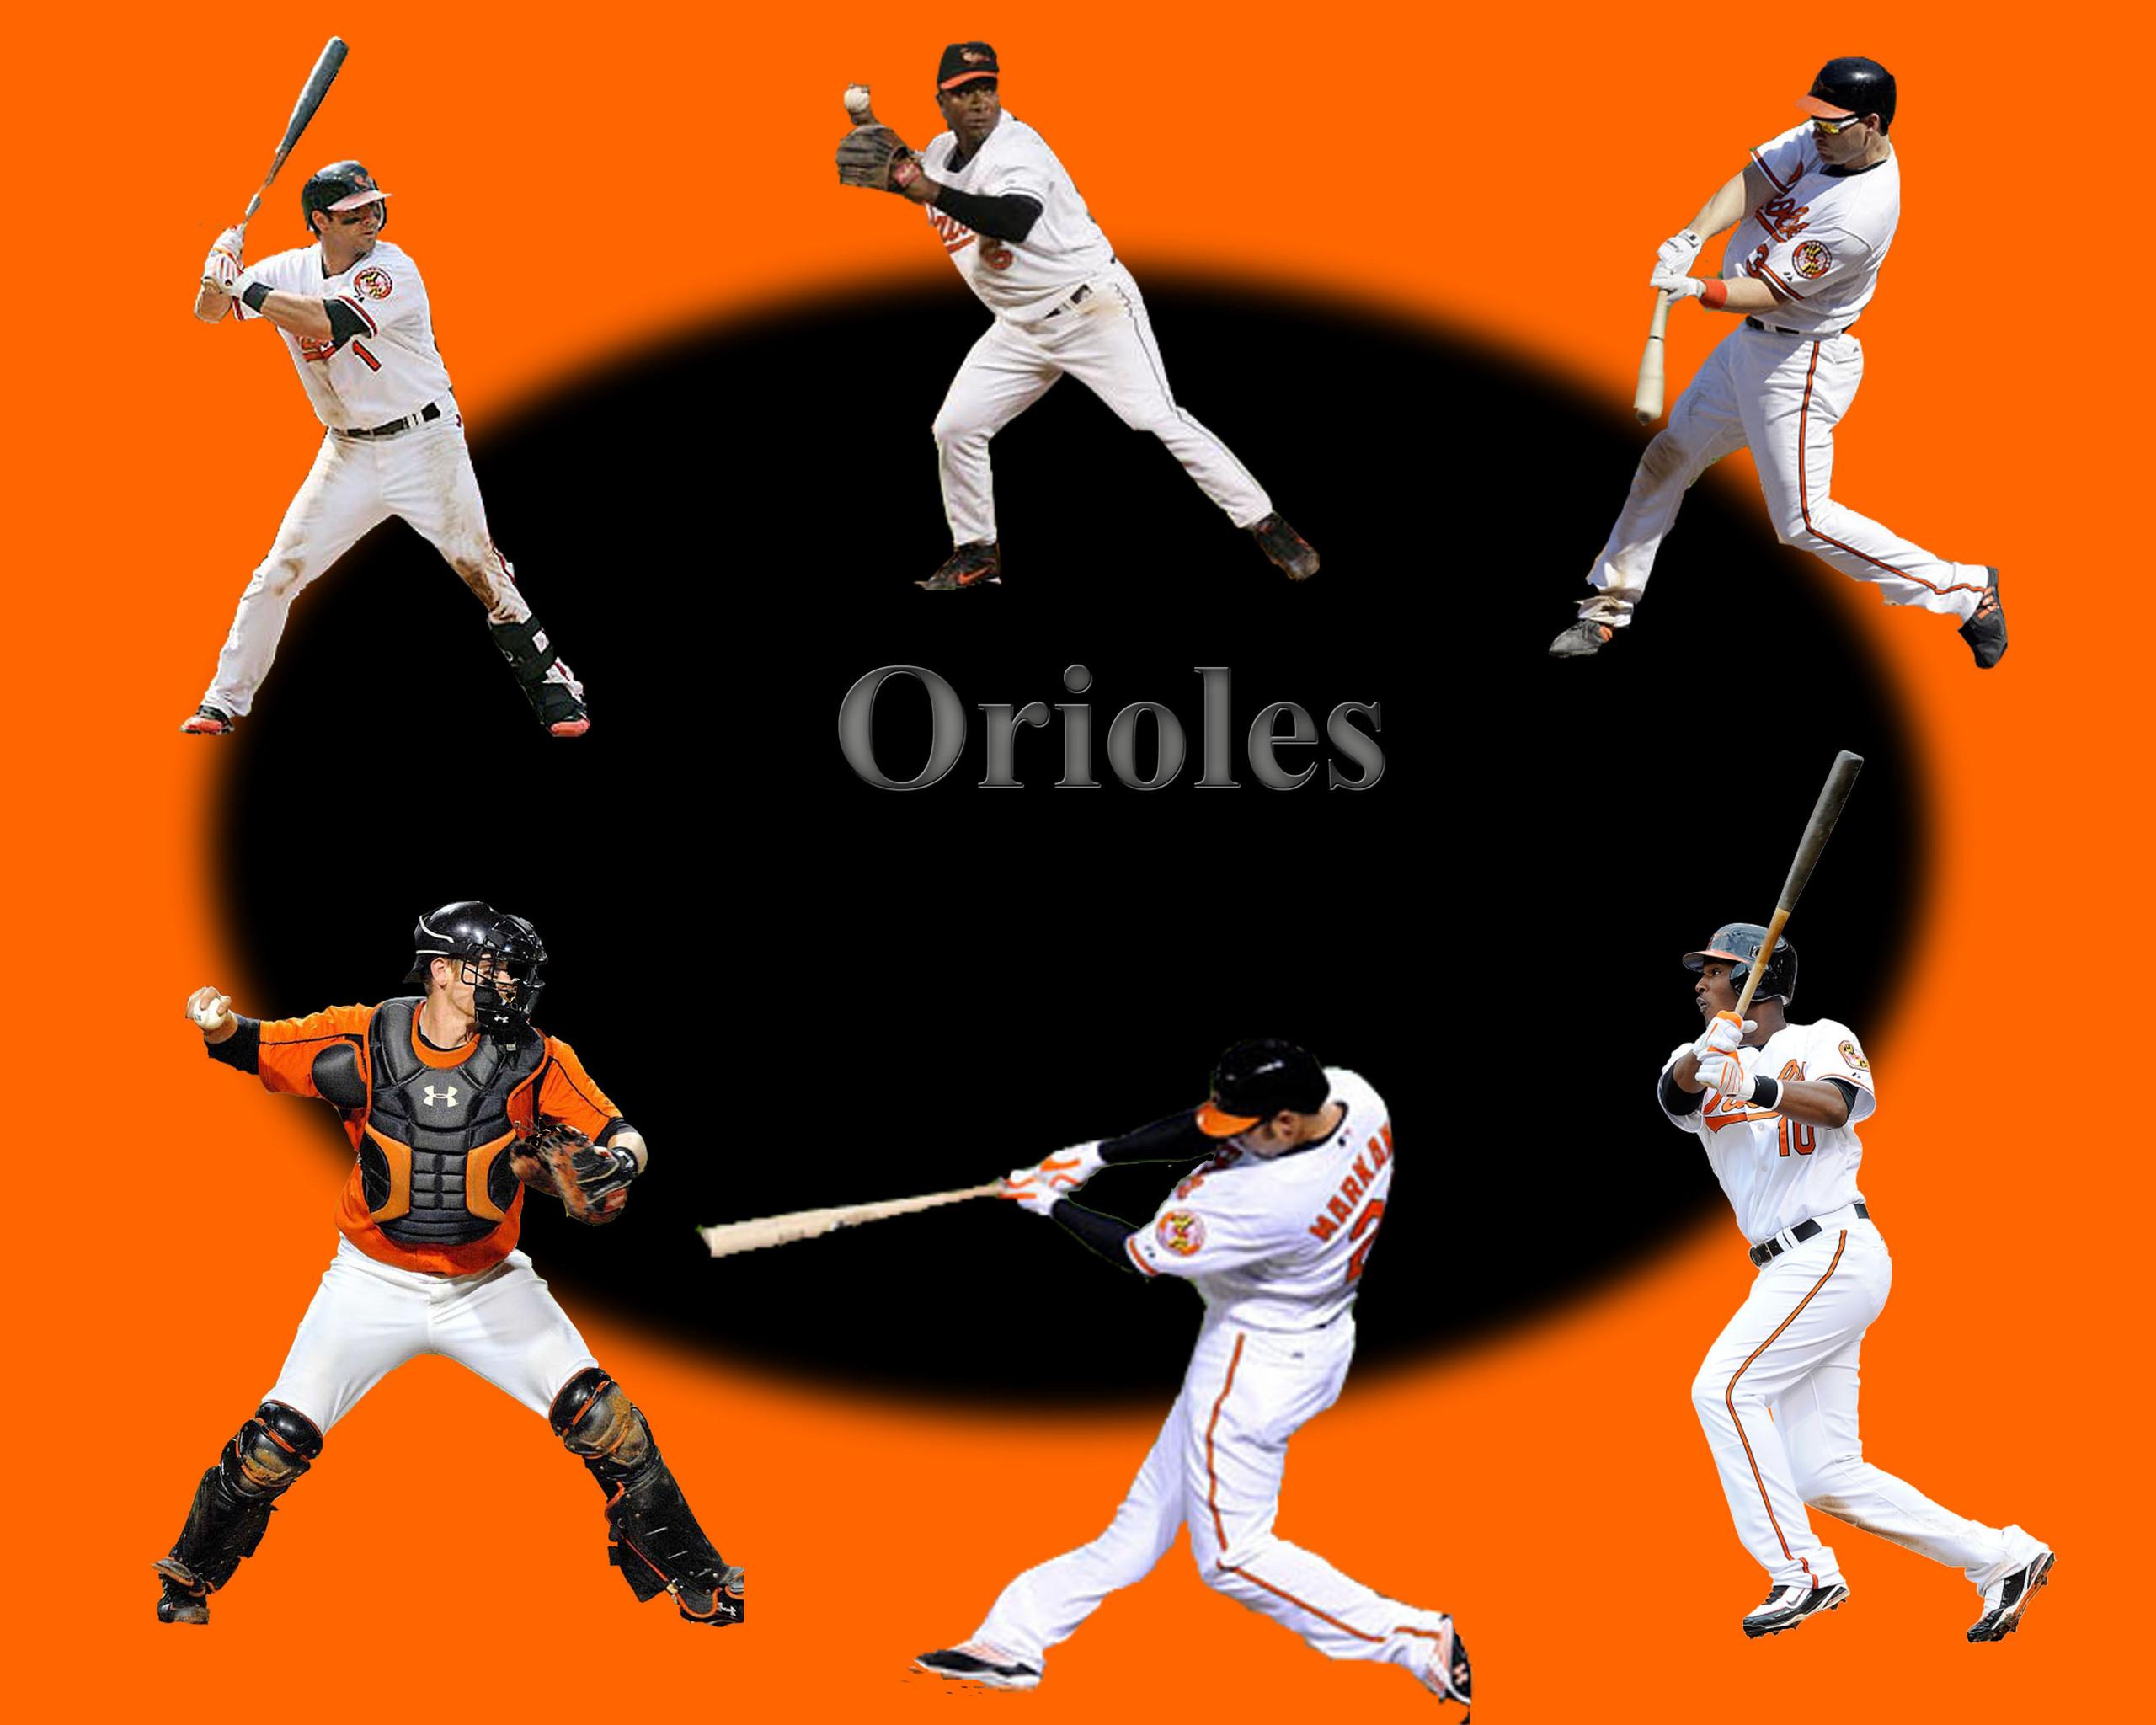 wallpaper - Baltimore Orioles Wallpaper